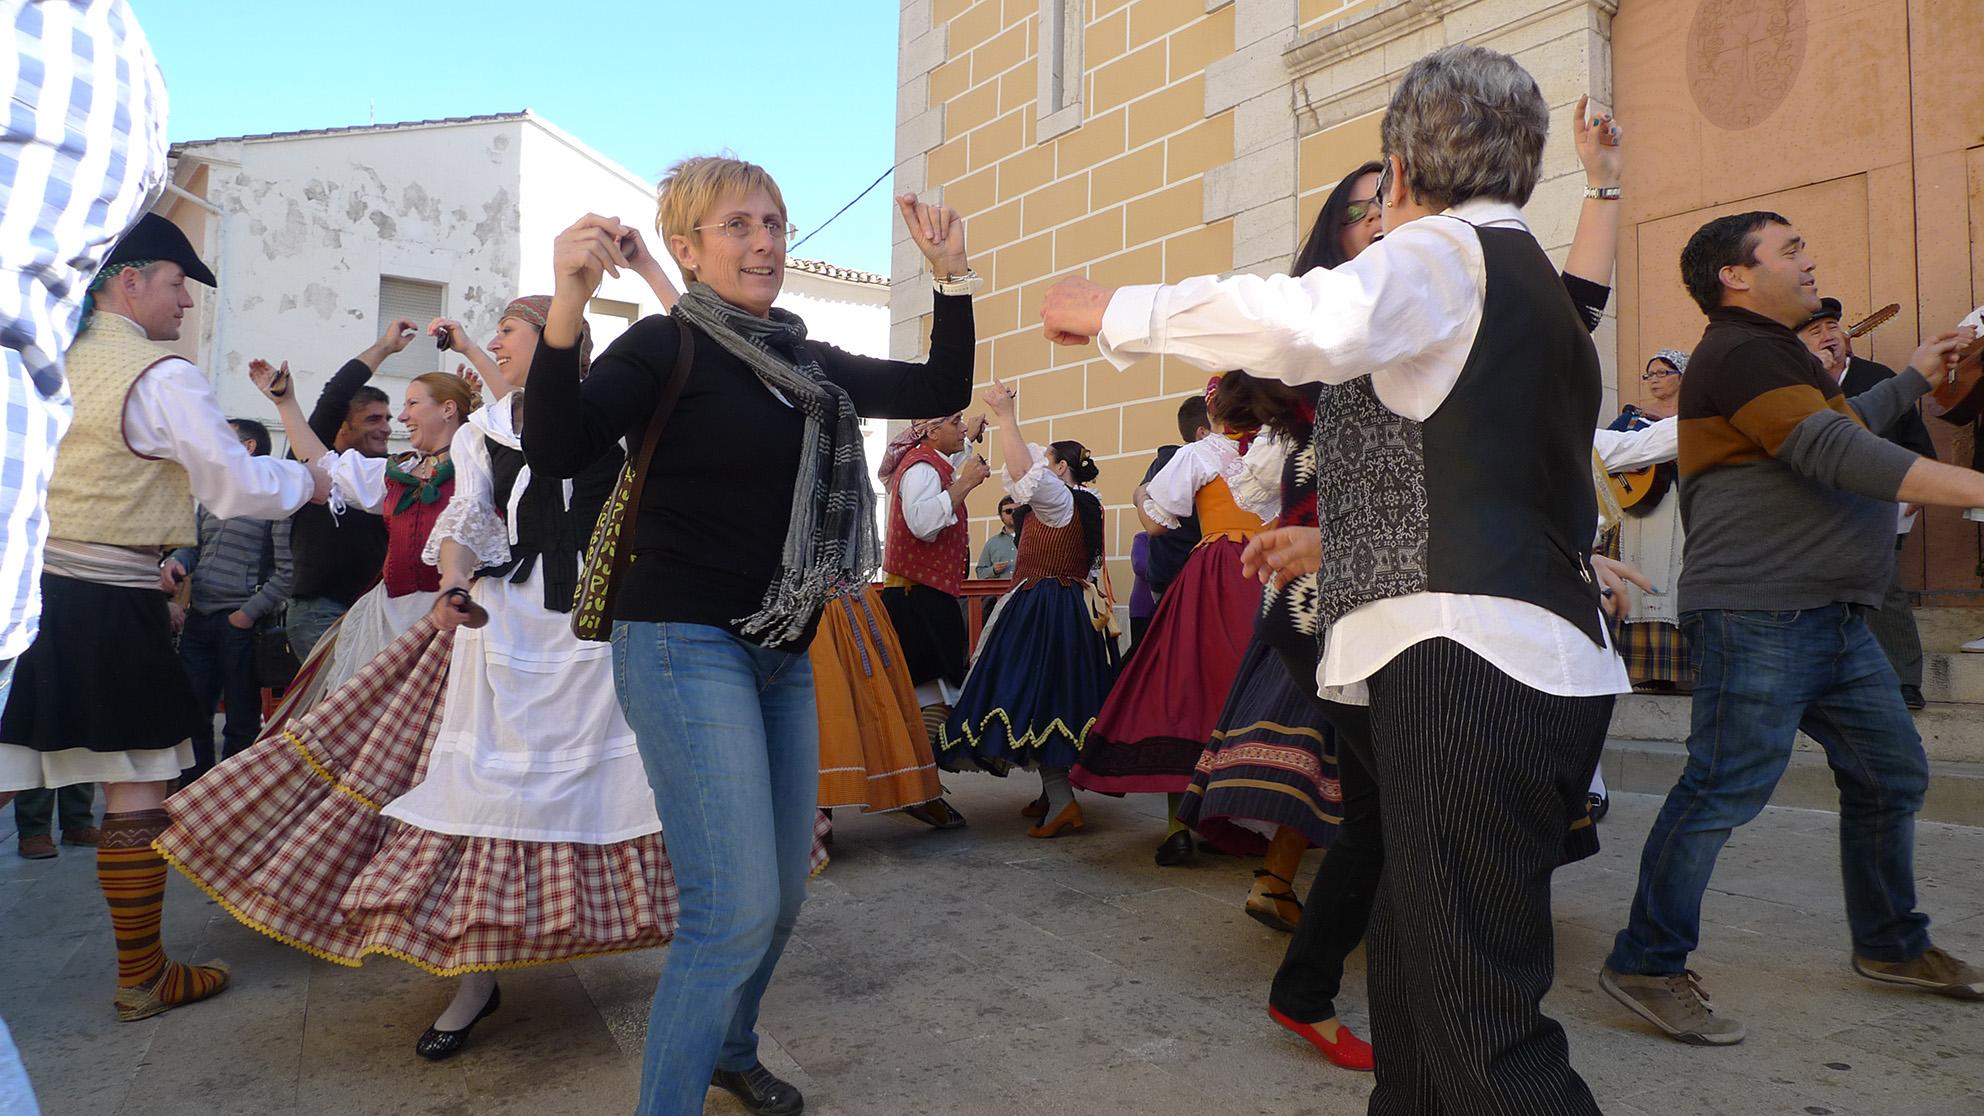 2014-02-23 - Baladre a Fira St. Marcia-ROTOVA (113)